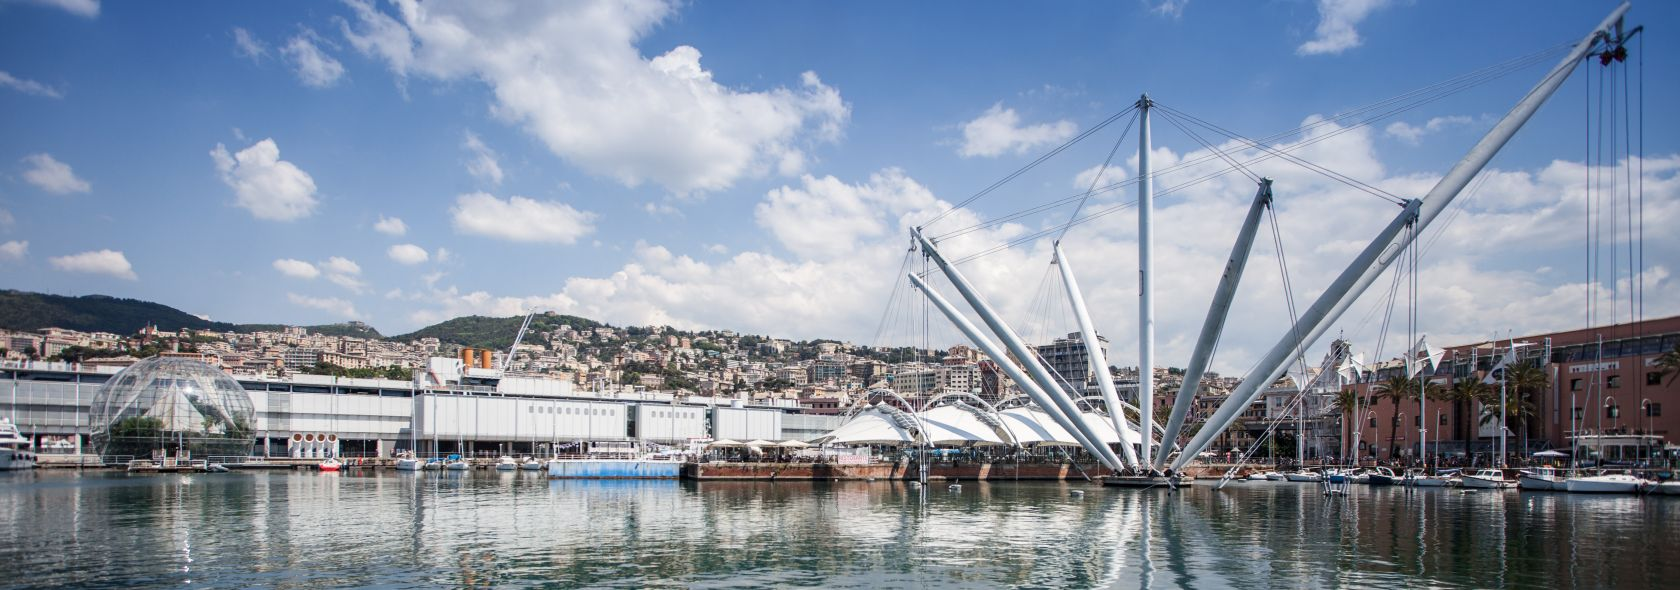 Genoa's harbor tour